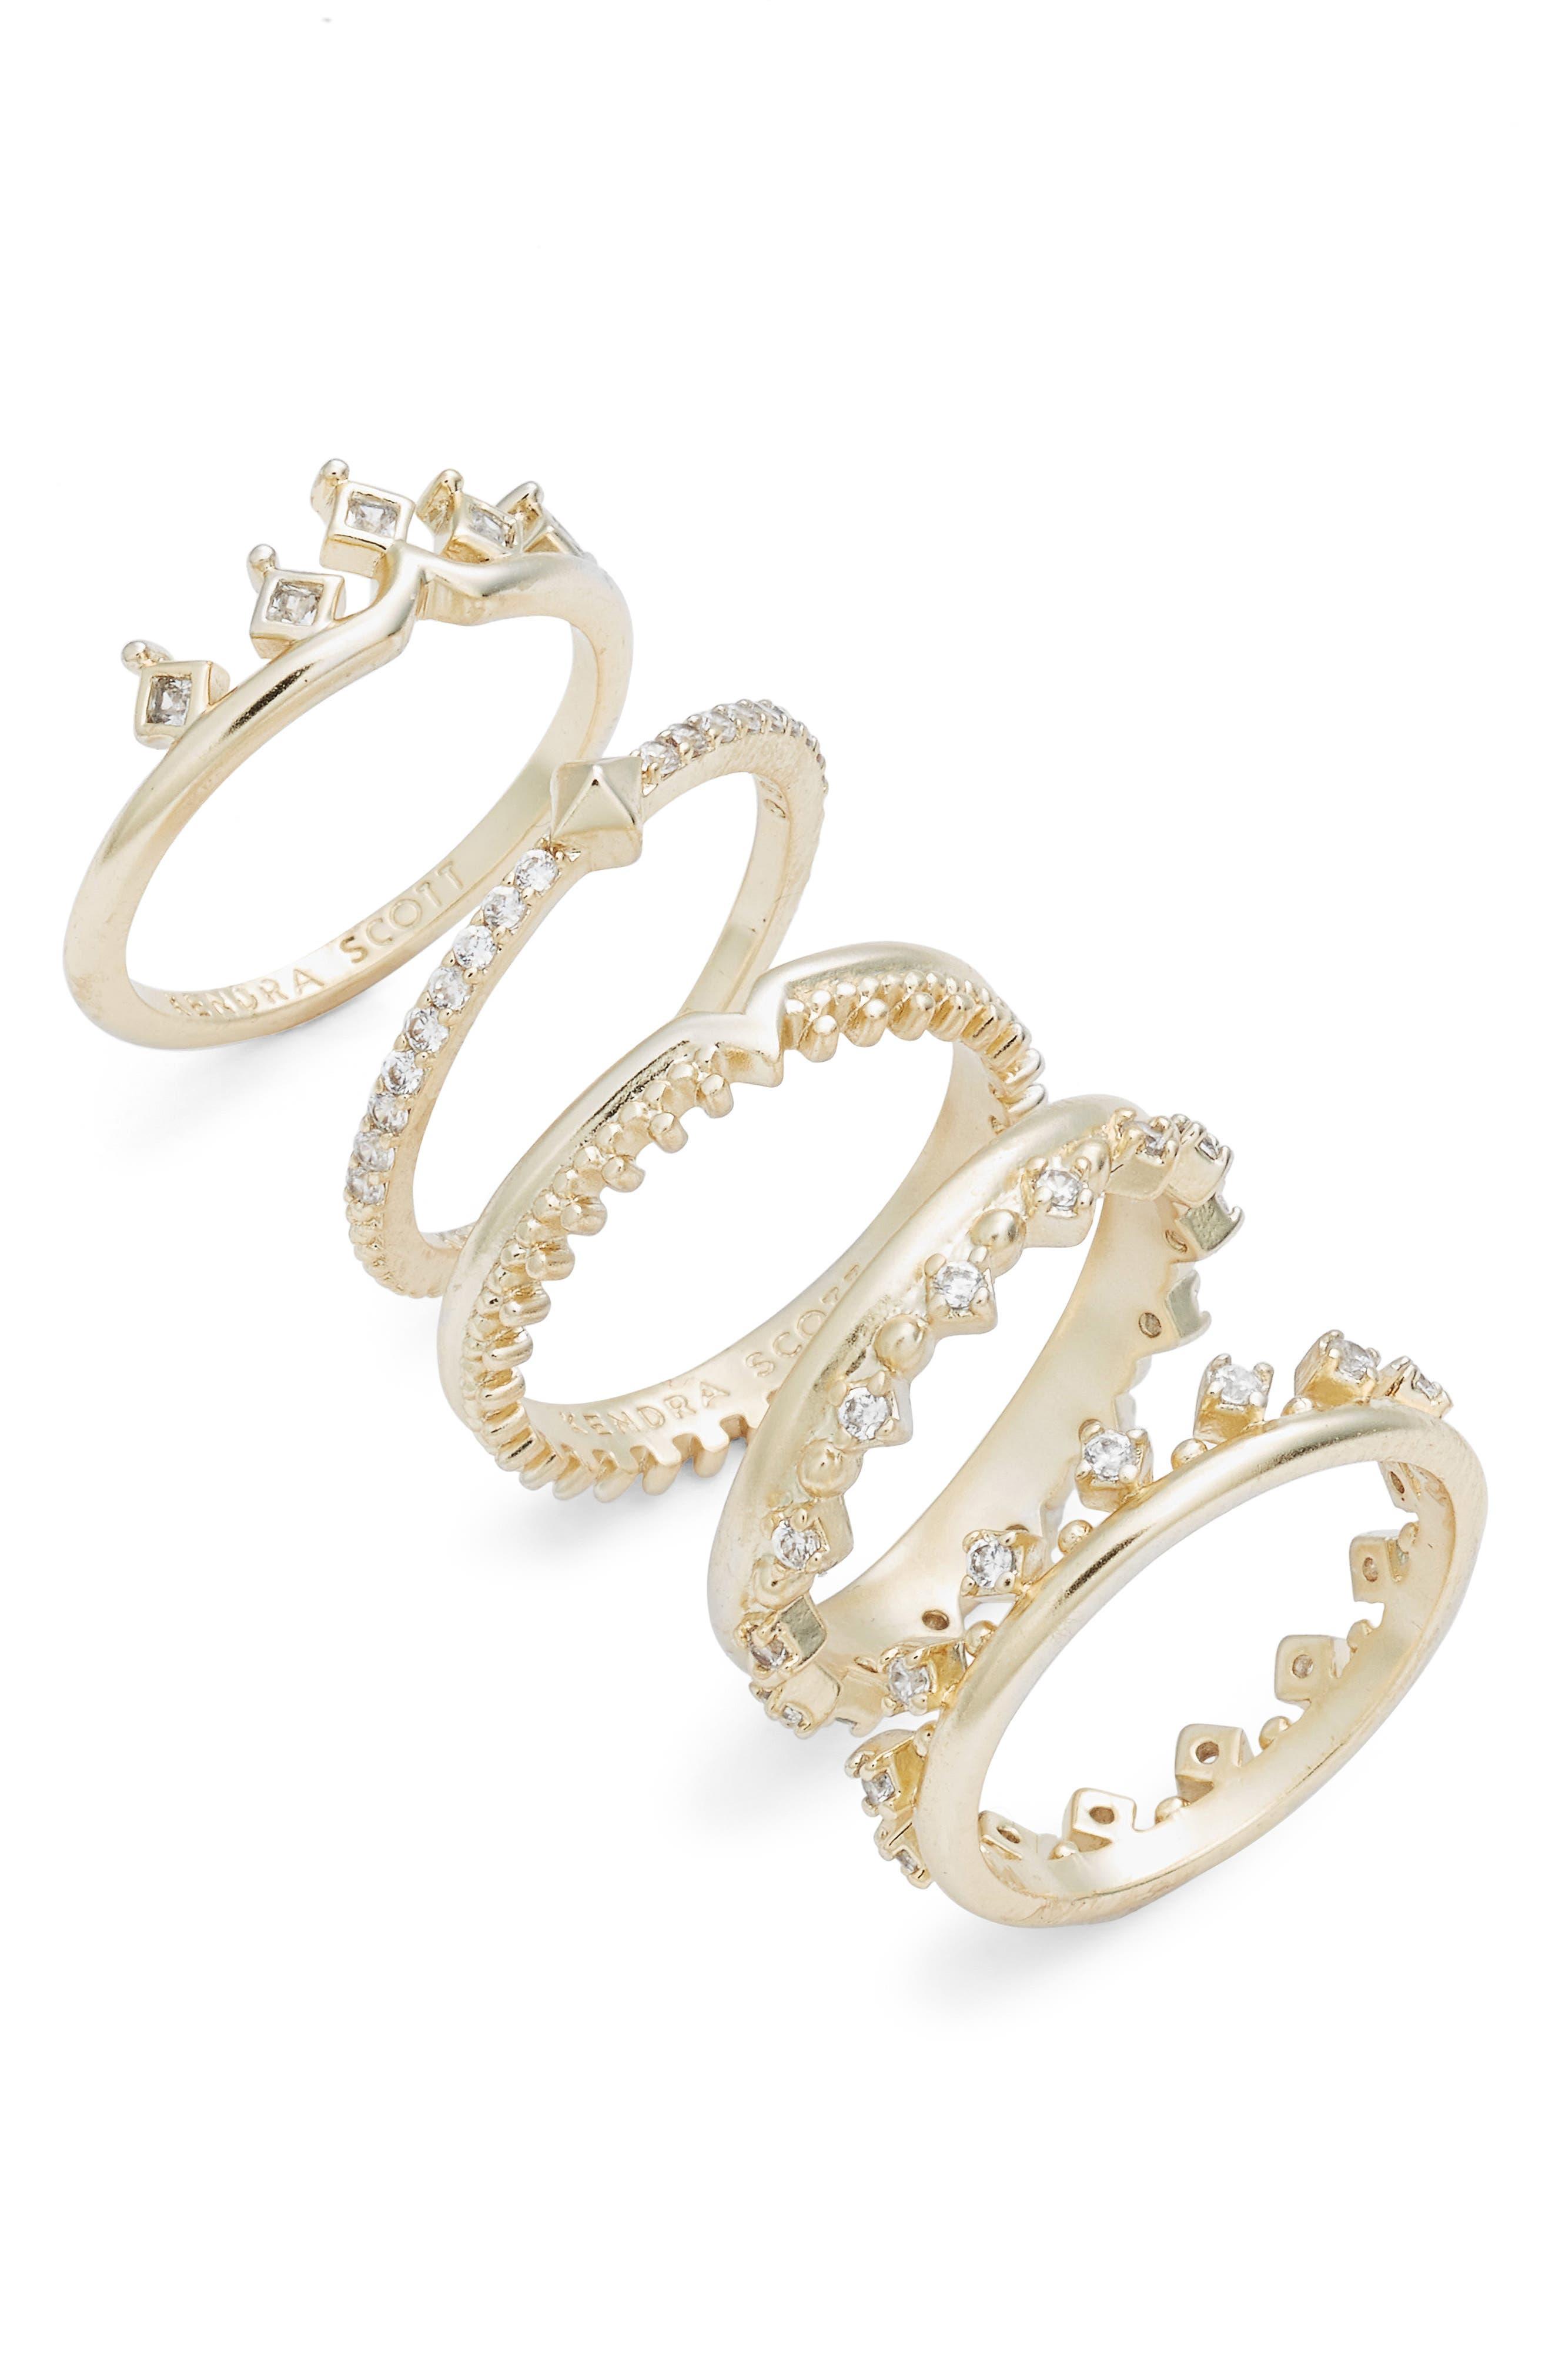 Main Image - Kendra Scott Set of 5 Violette Rings